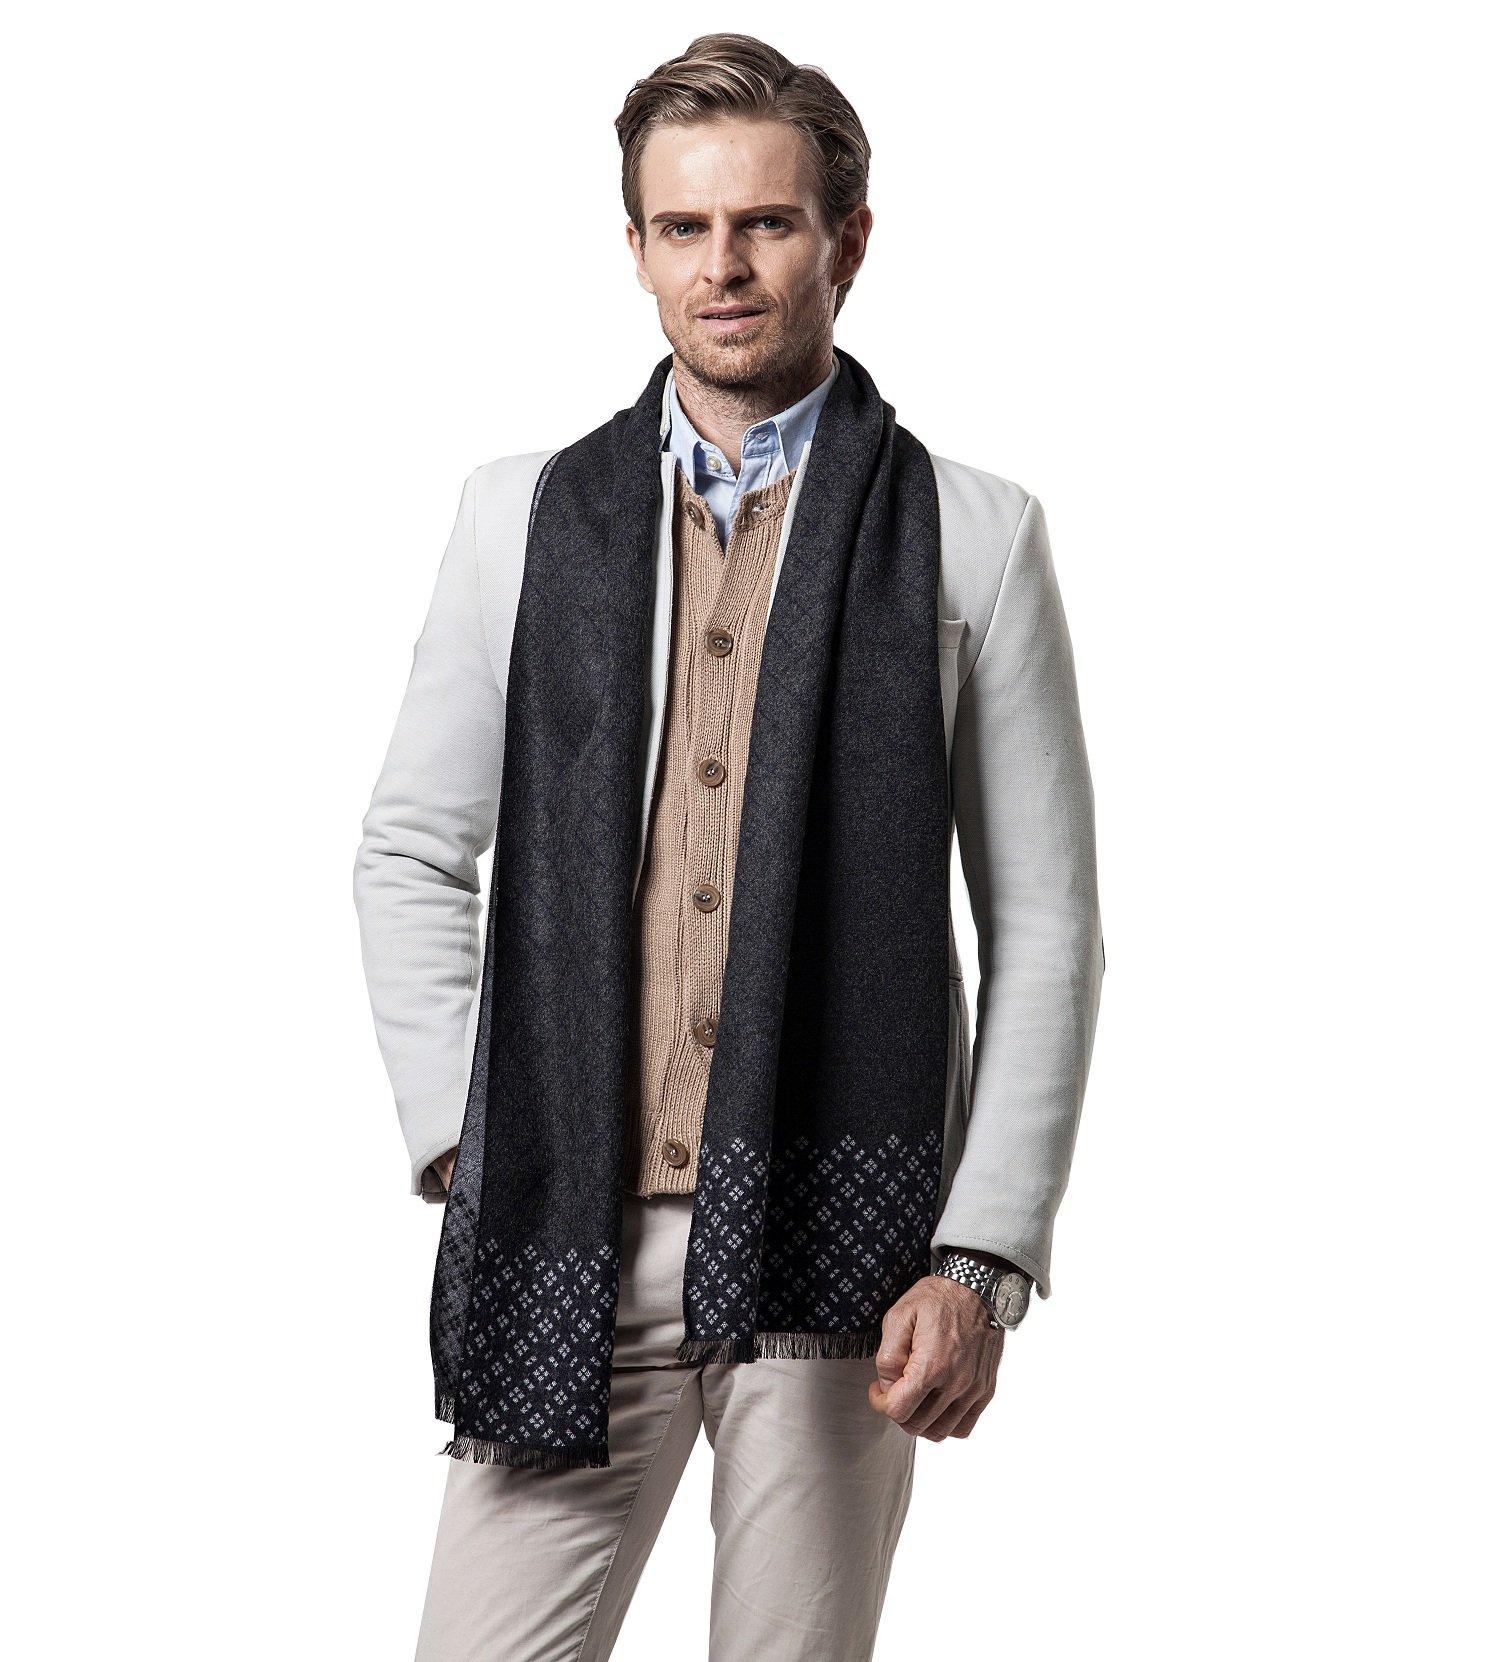 Scarf for Men,Men's Cashmere Scarf Classic Plaid Leisure Business Neckerchief (Gray)